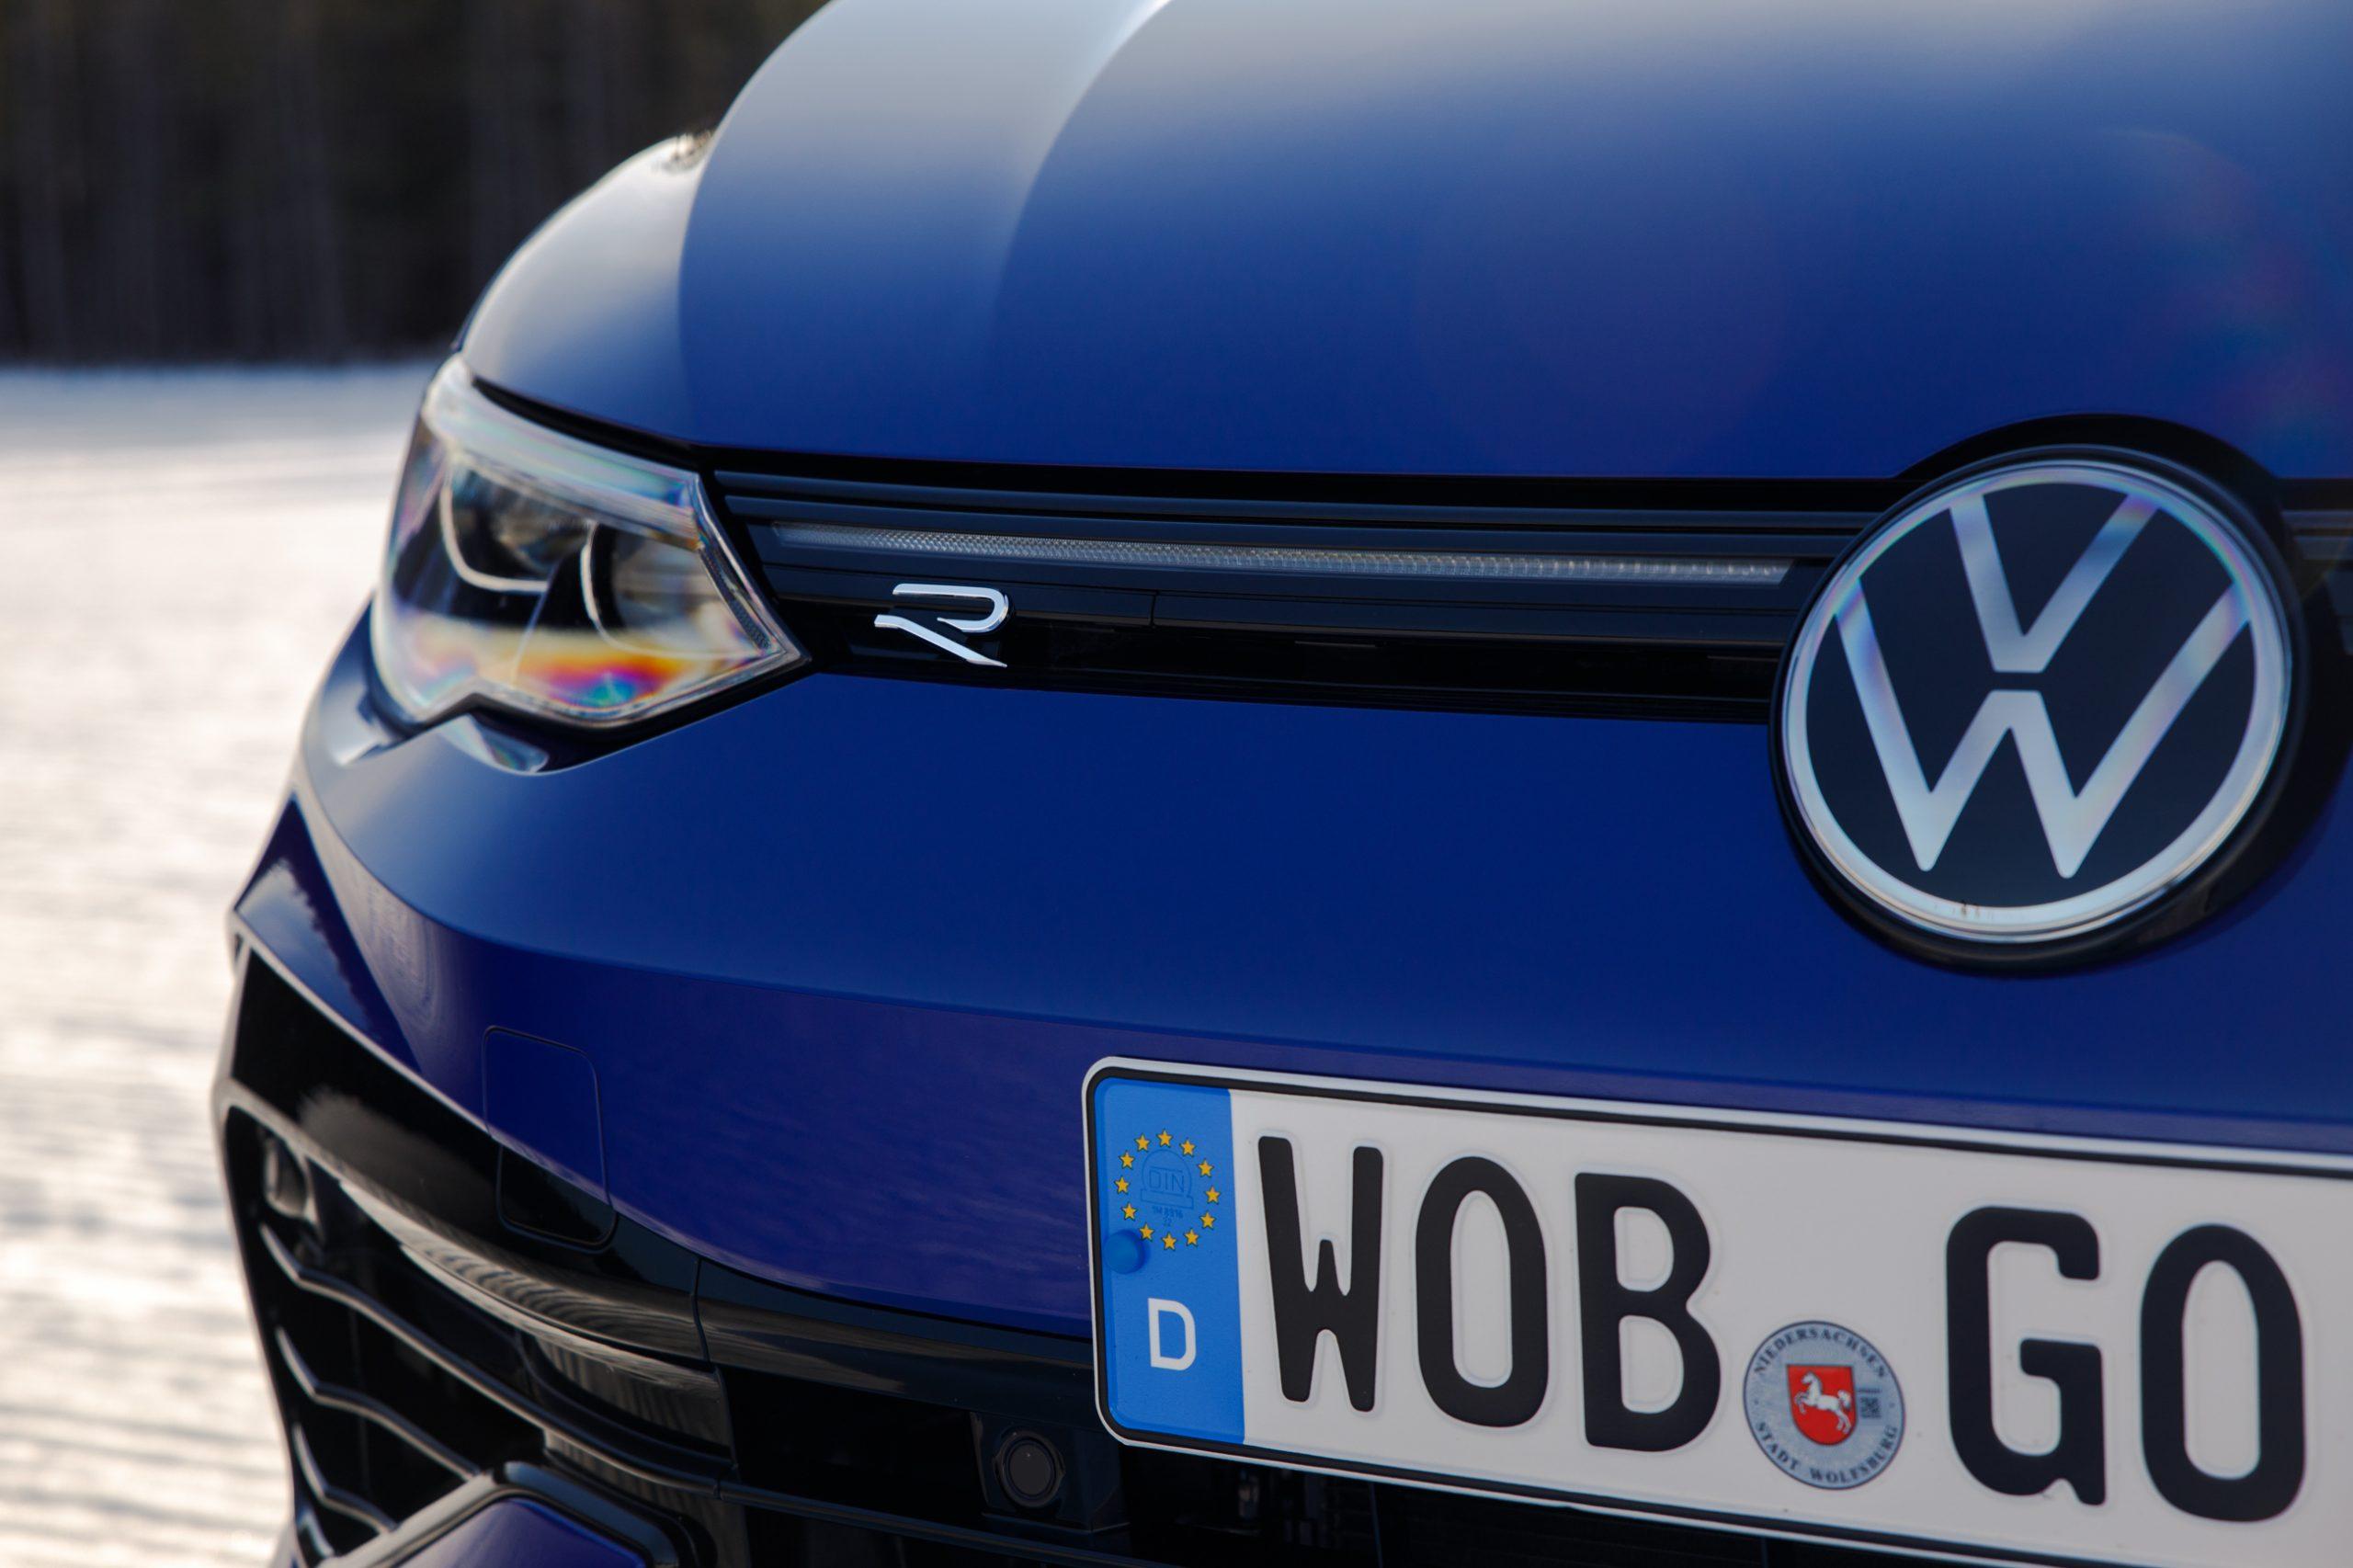 2022 Volkswagen Golf R front corner detail